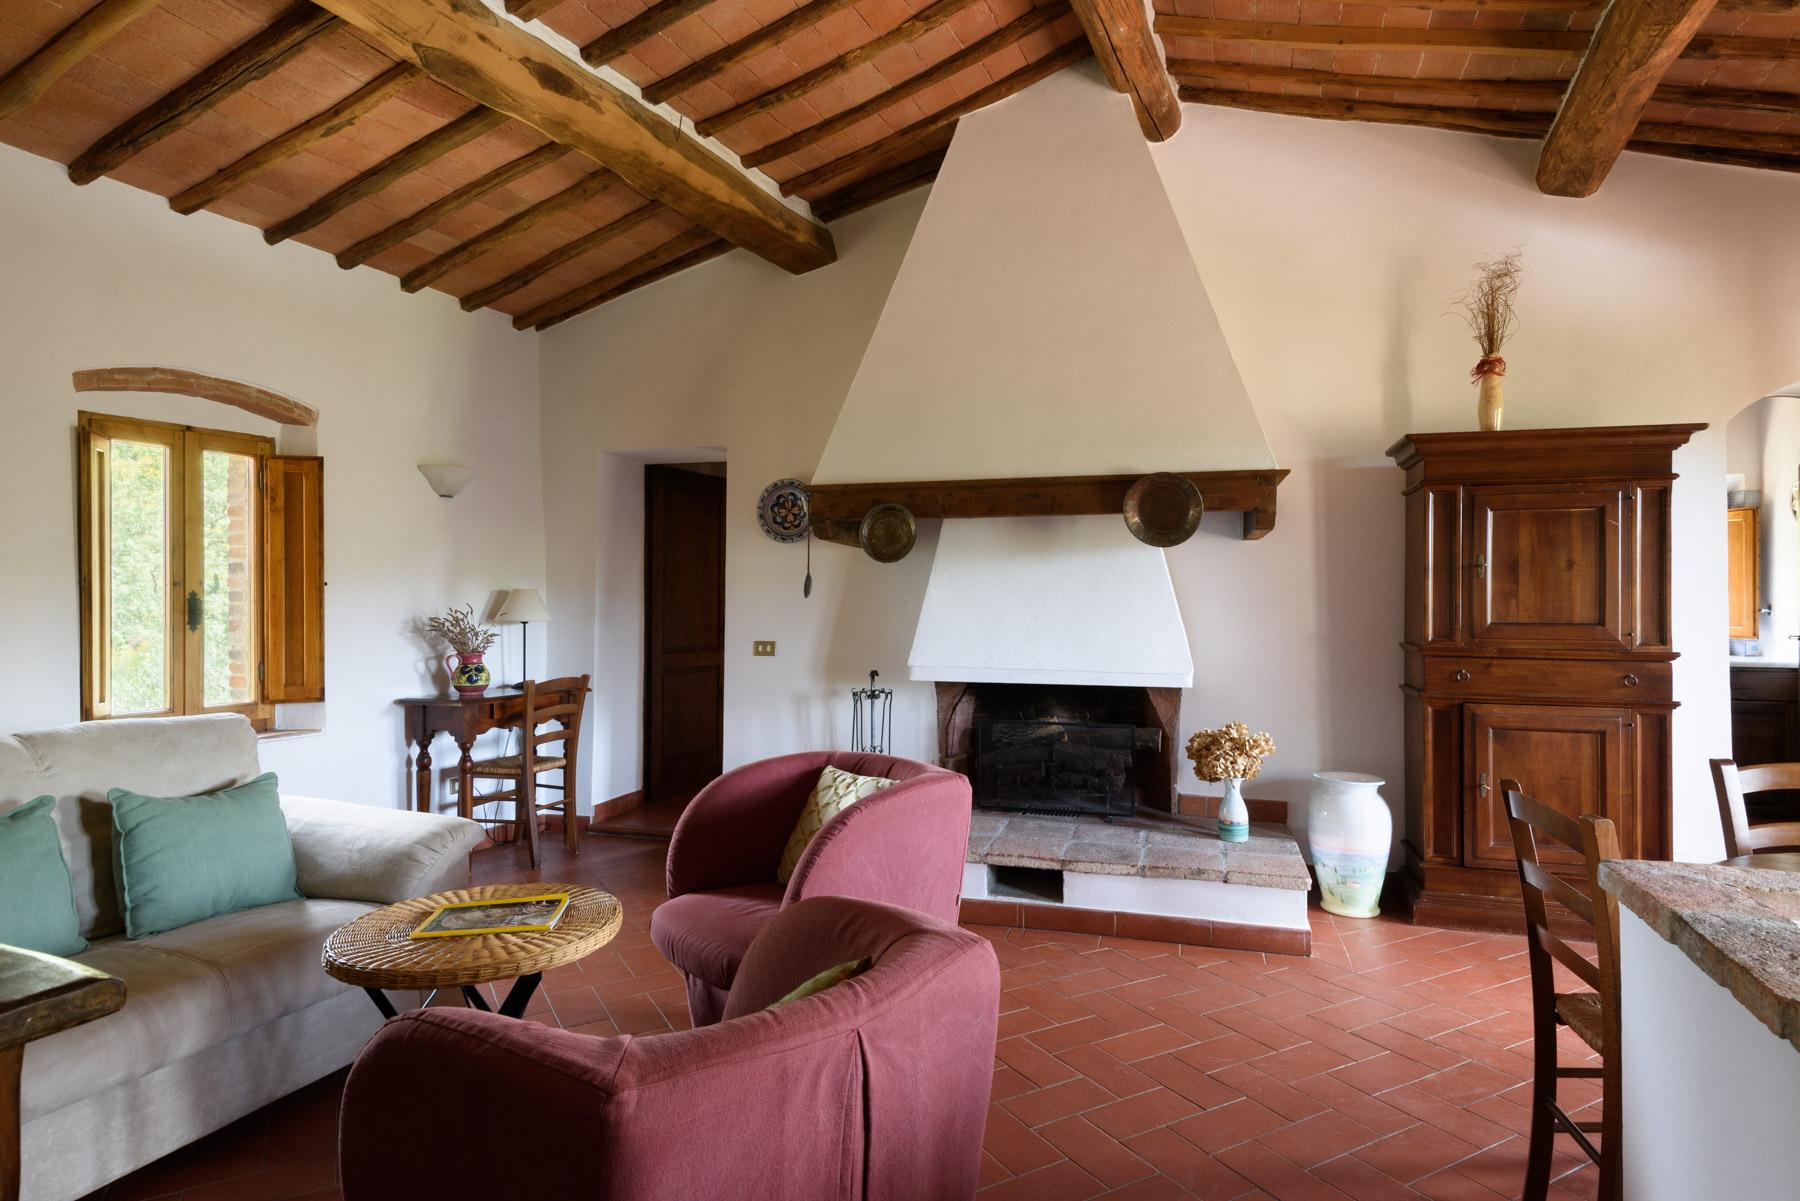 Rustico in Vendita a Castellina In Chianti: 5 locali, 650 mq - Foto 16